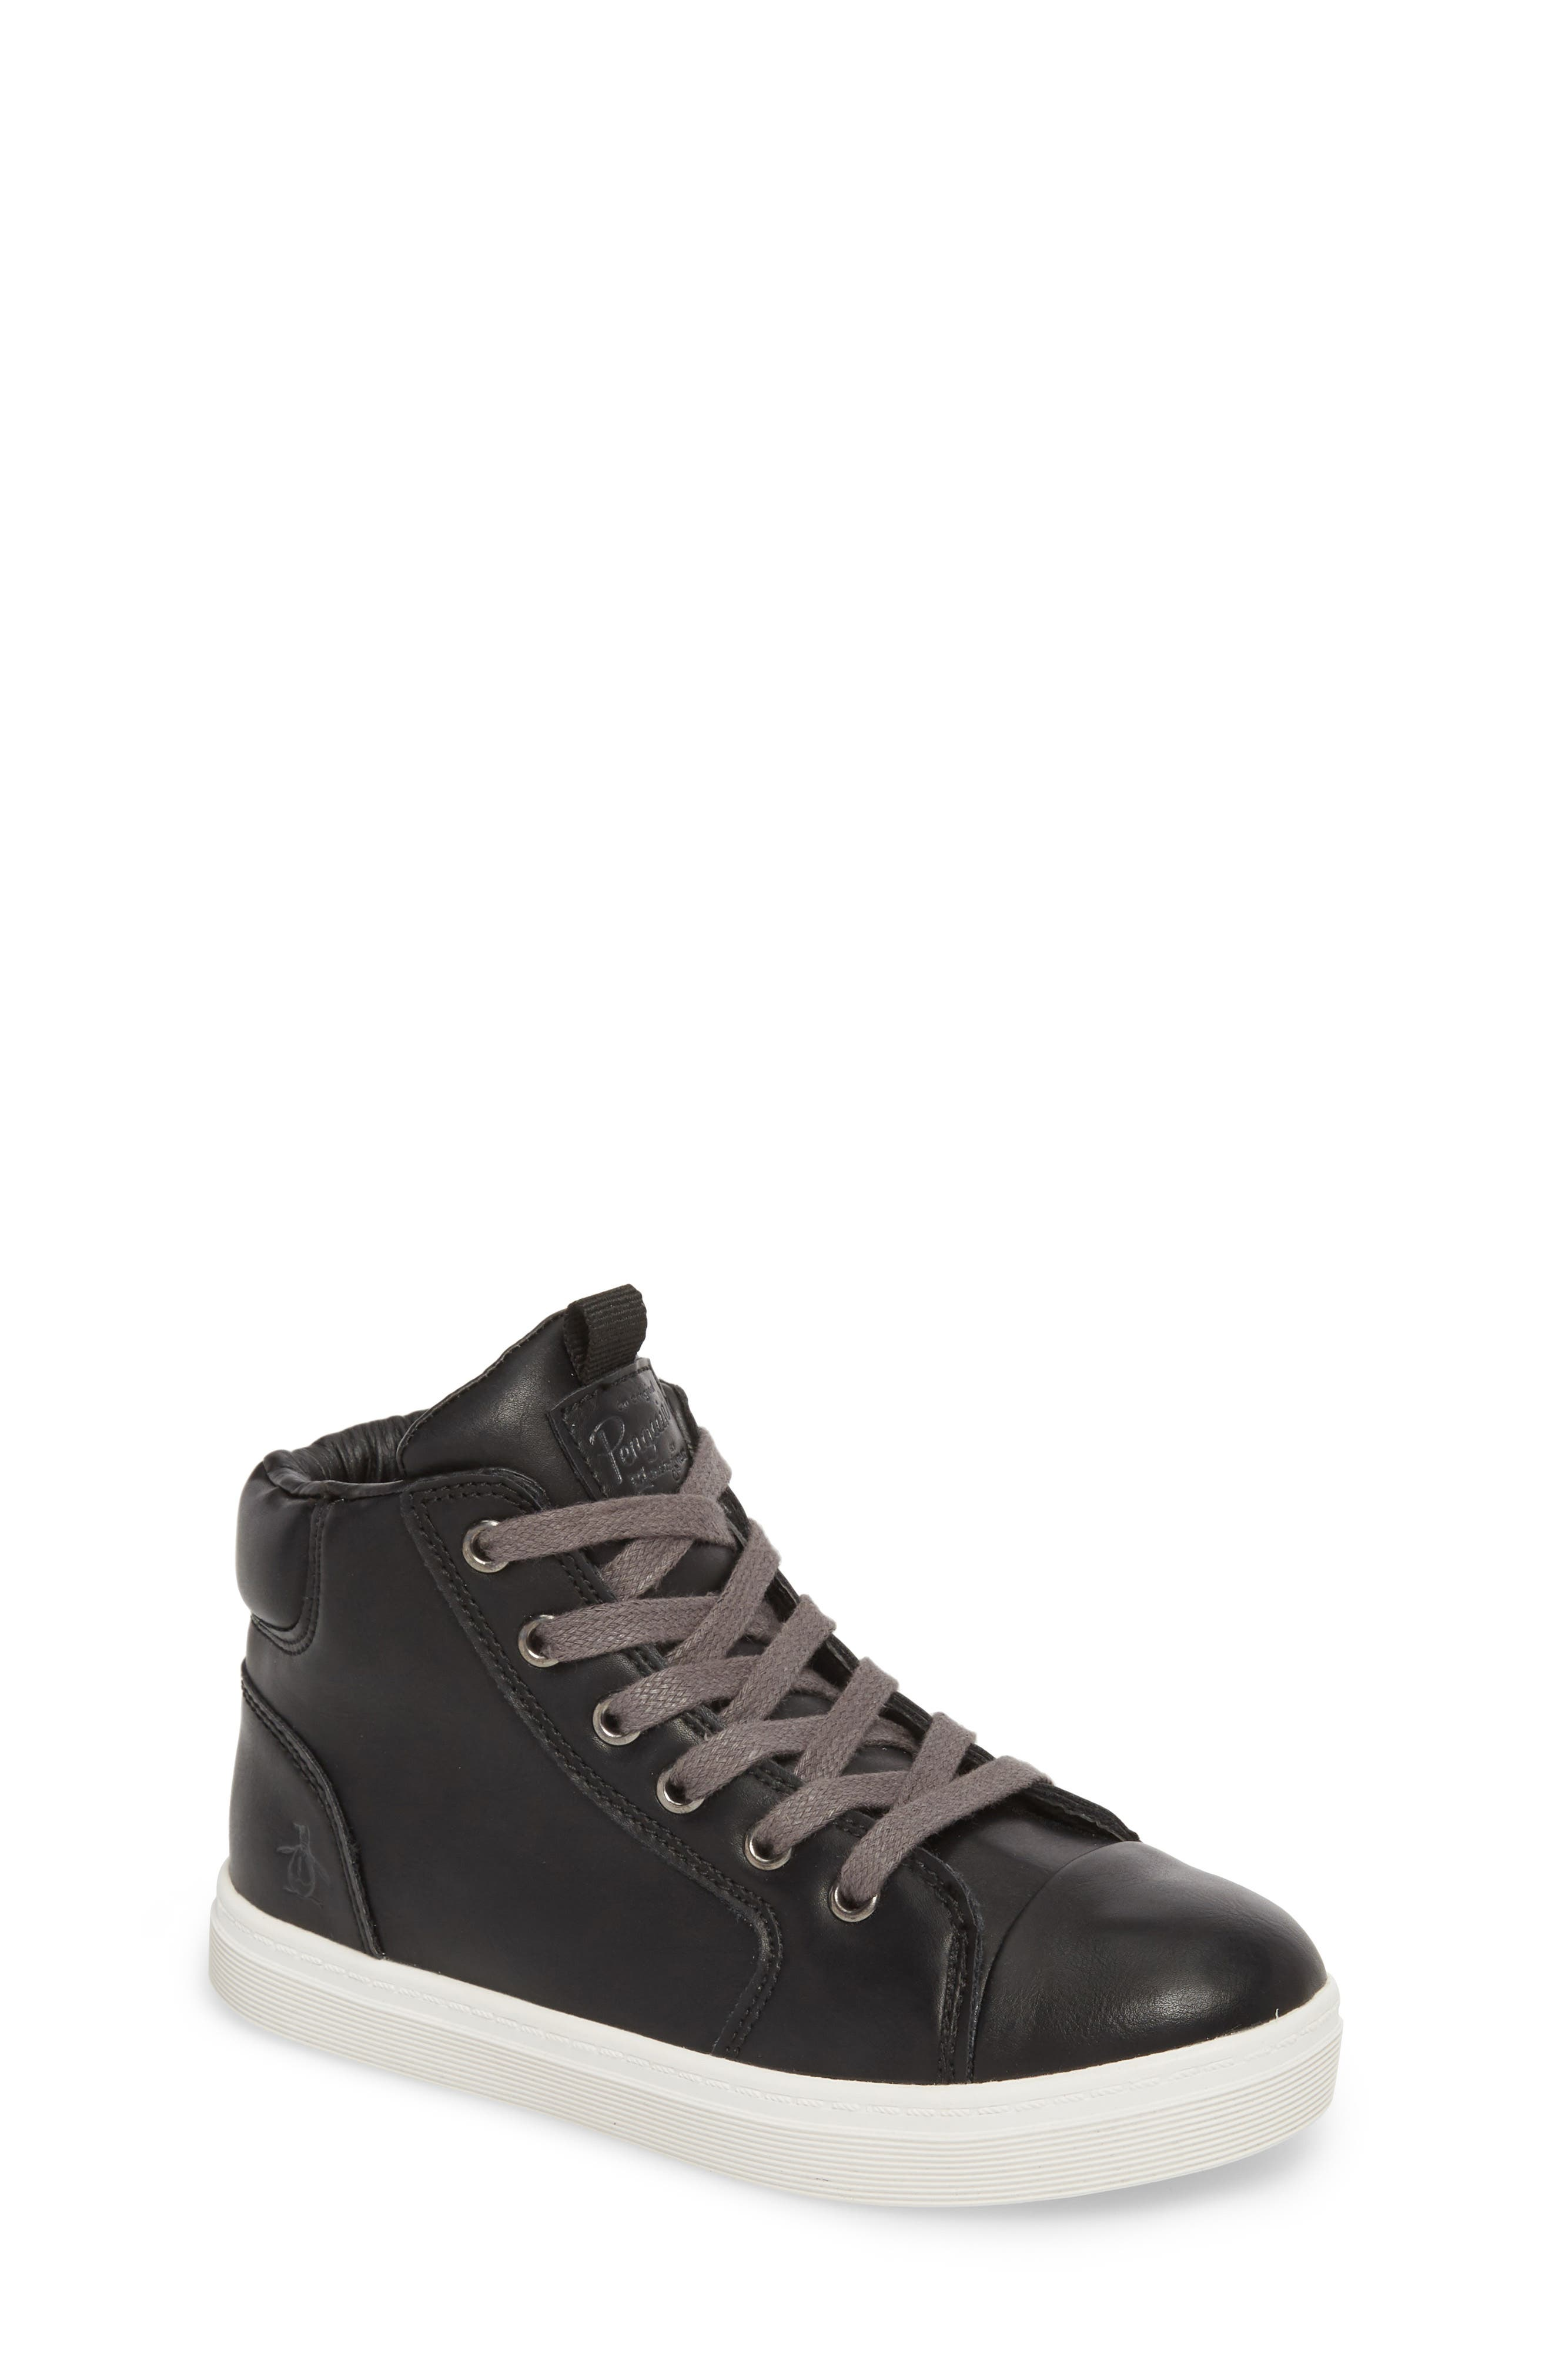 Carson High Top Sneaker,                             Main thumbnail 1, color,                             BLACK